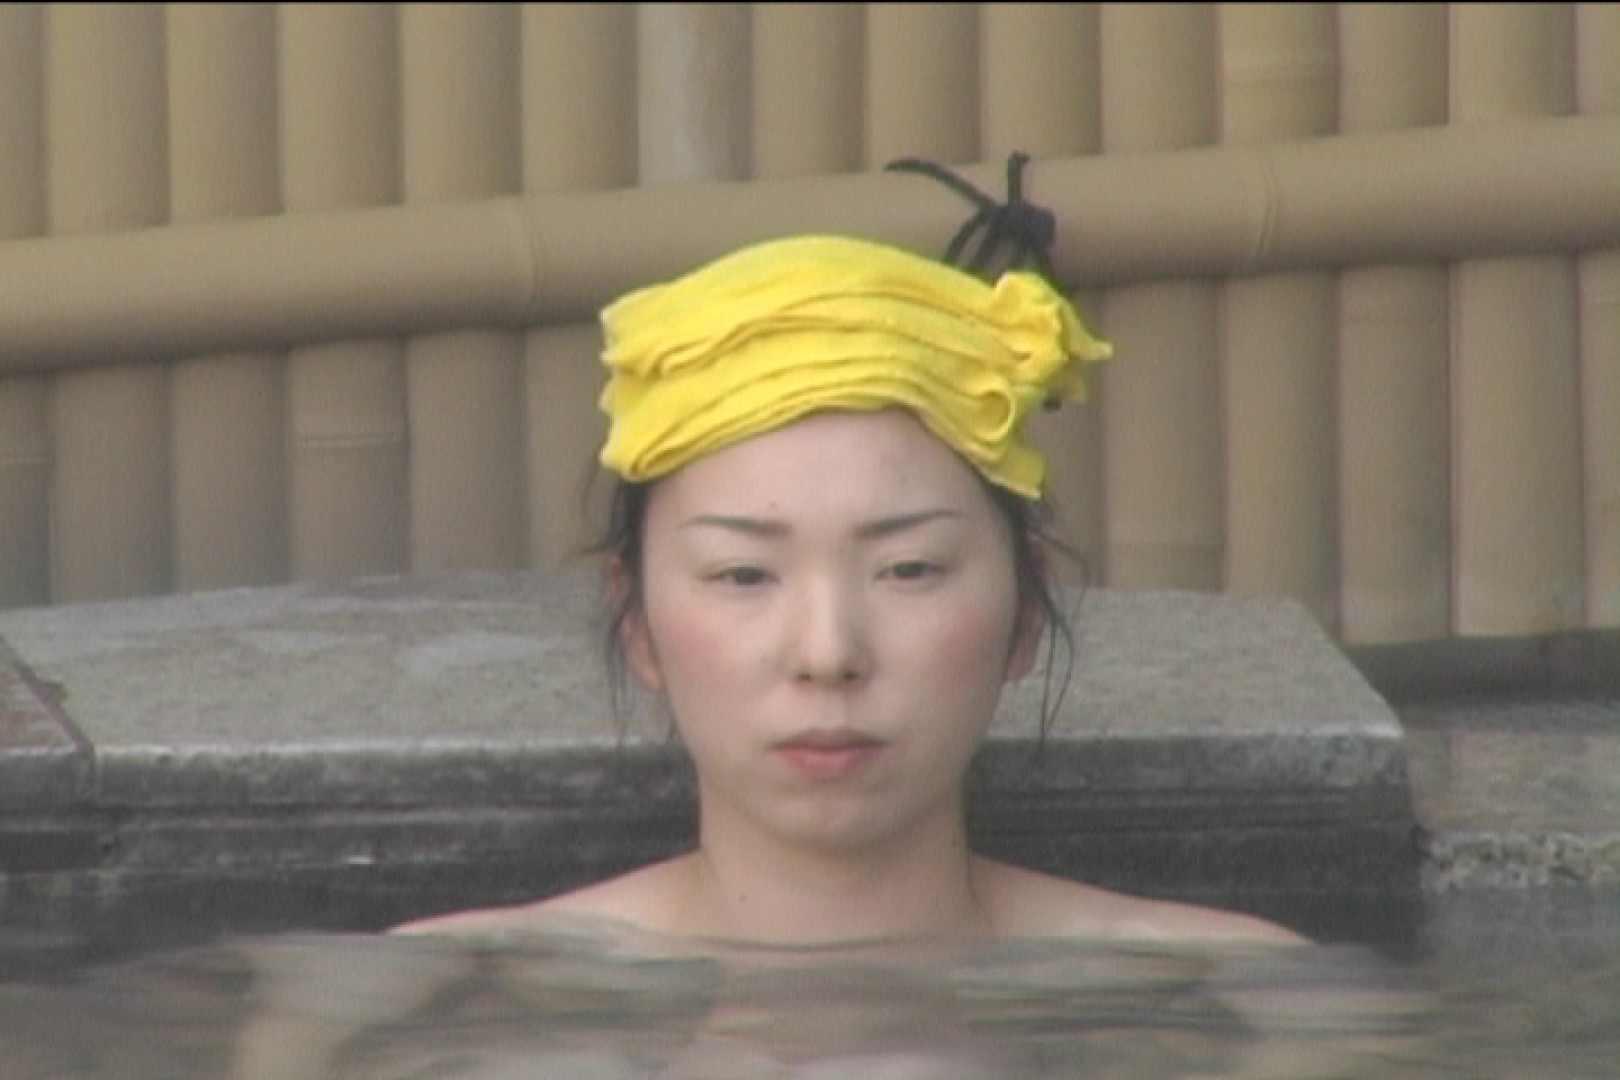 Aquaな露天風呂Vol.529 盗撮映像  51Pix 15